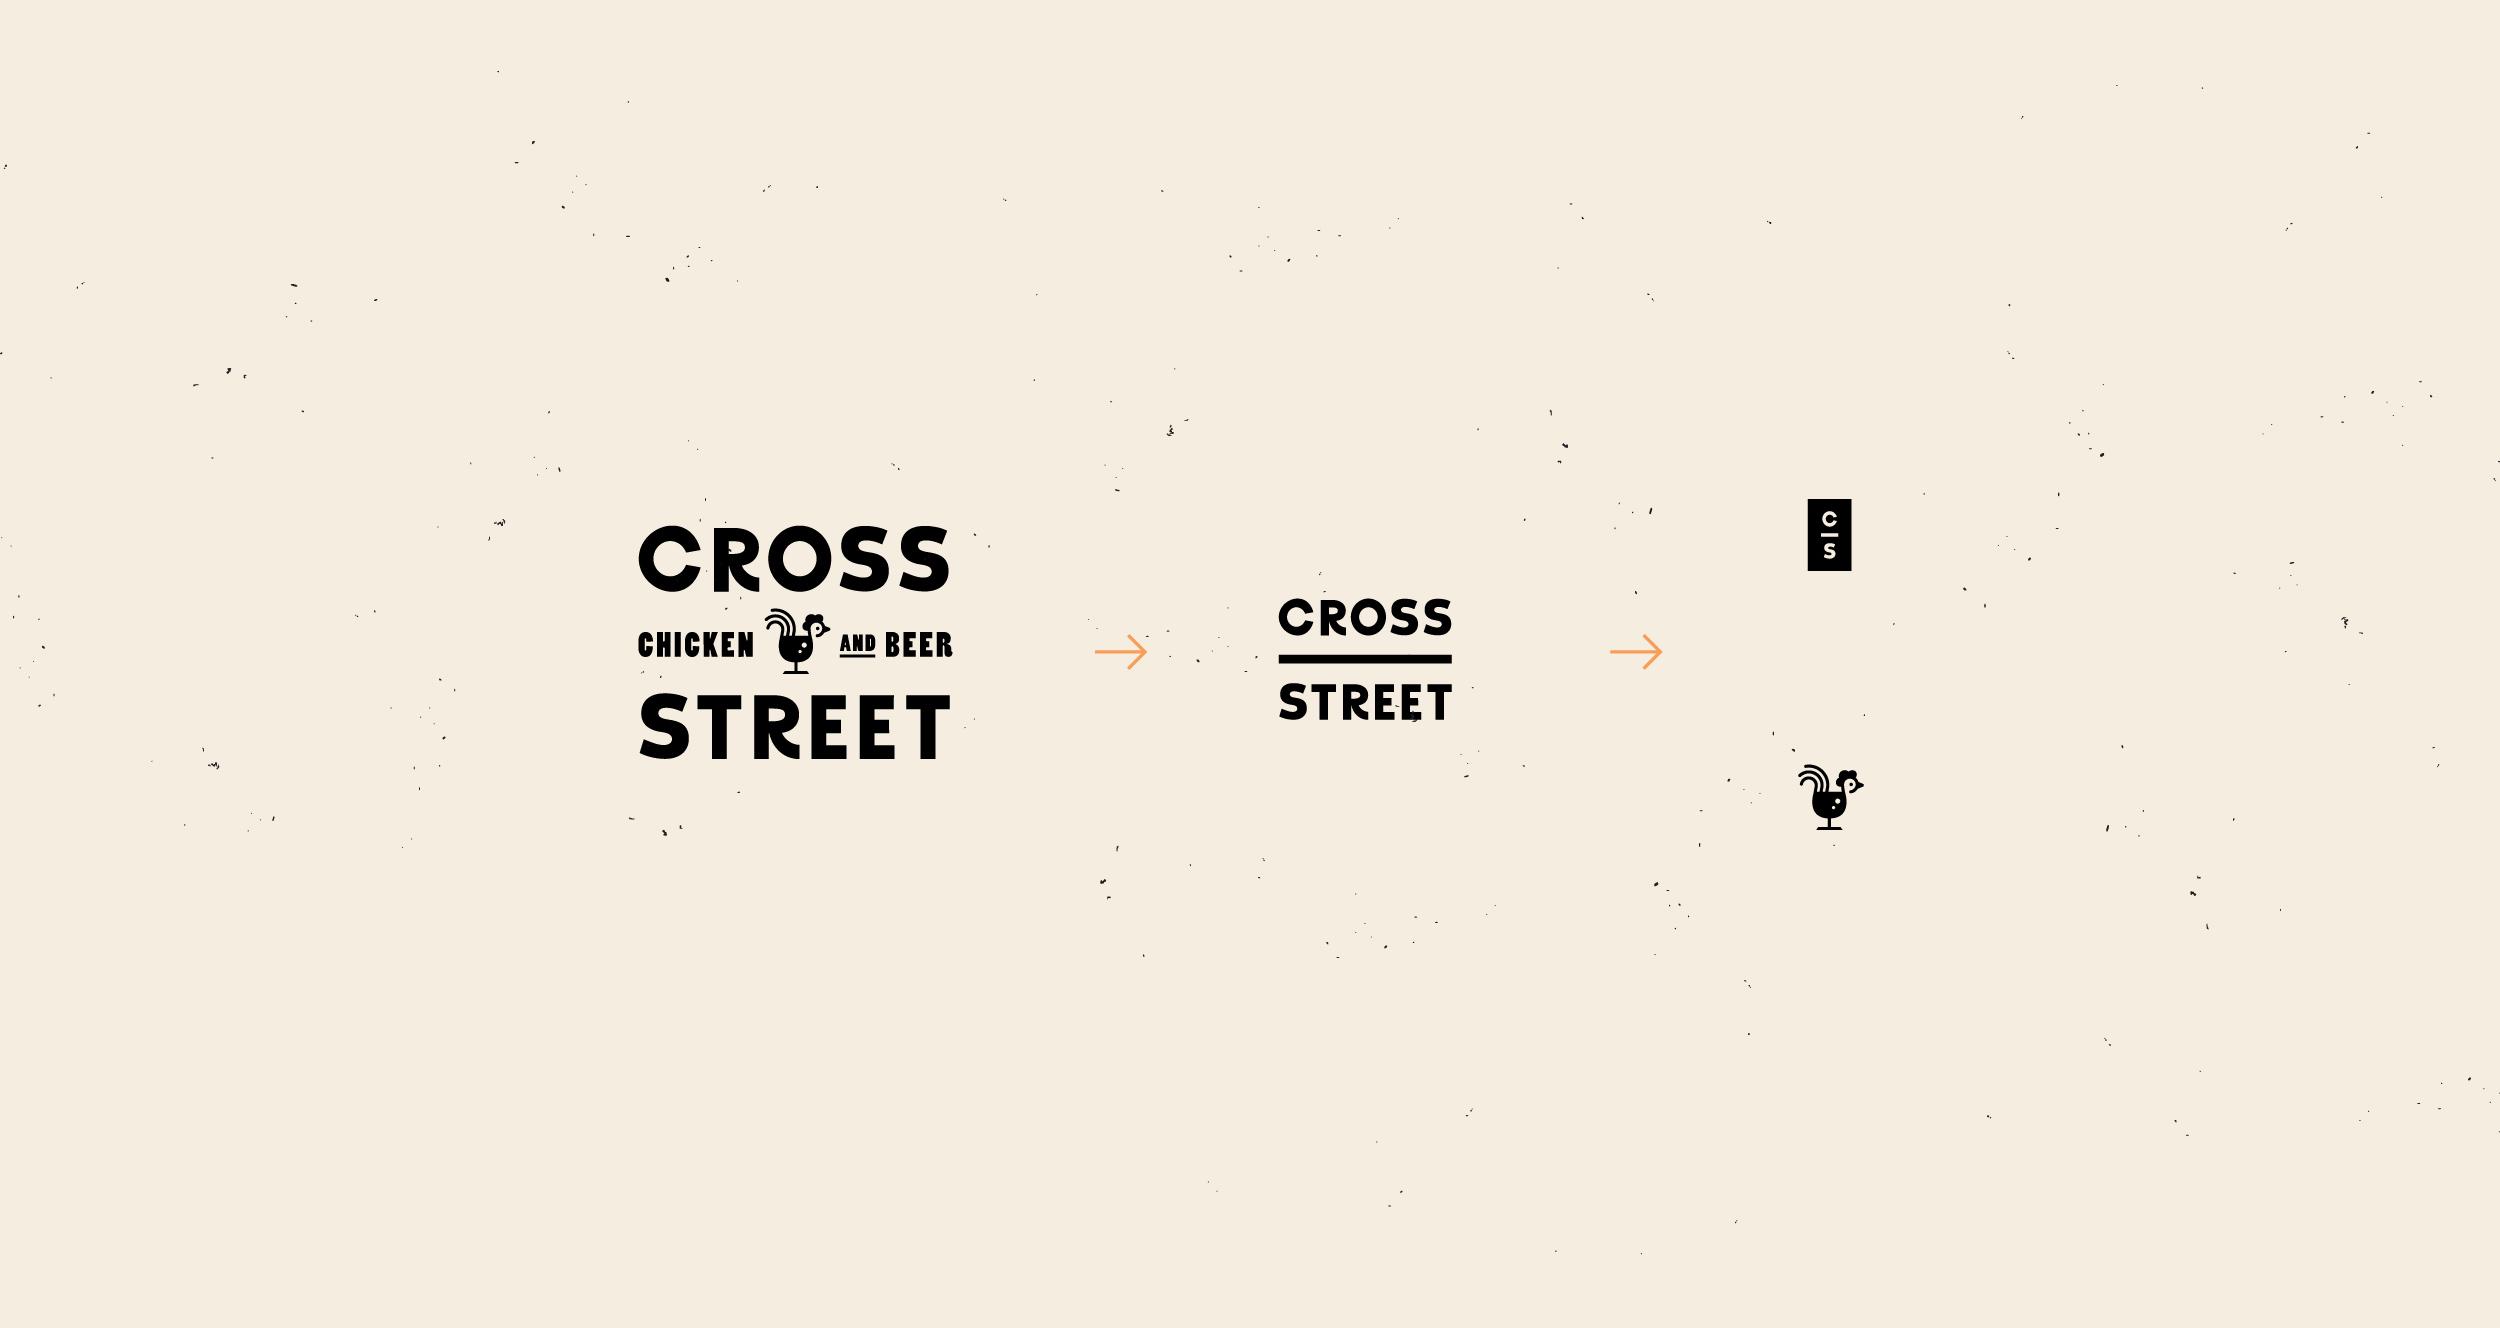 Cross Street chicken and beer restaurant branding by Meiwen See